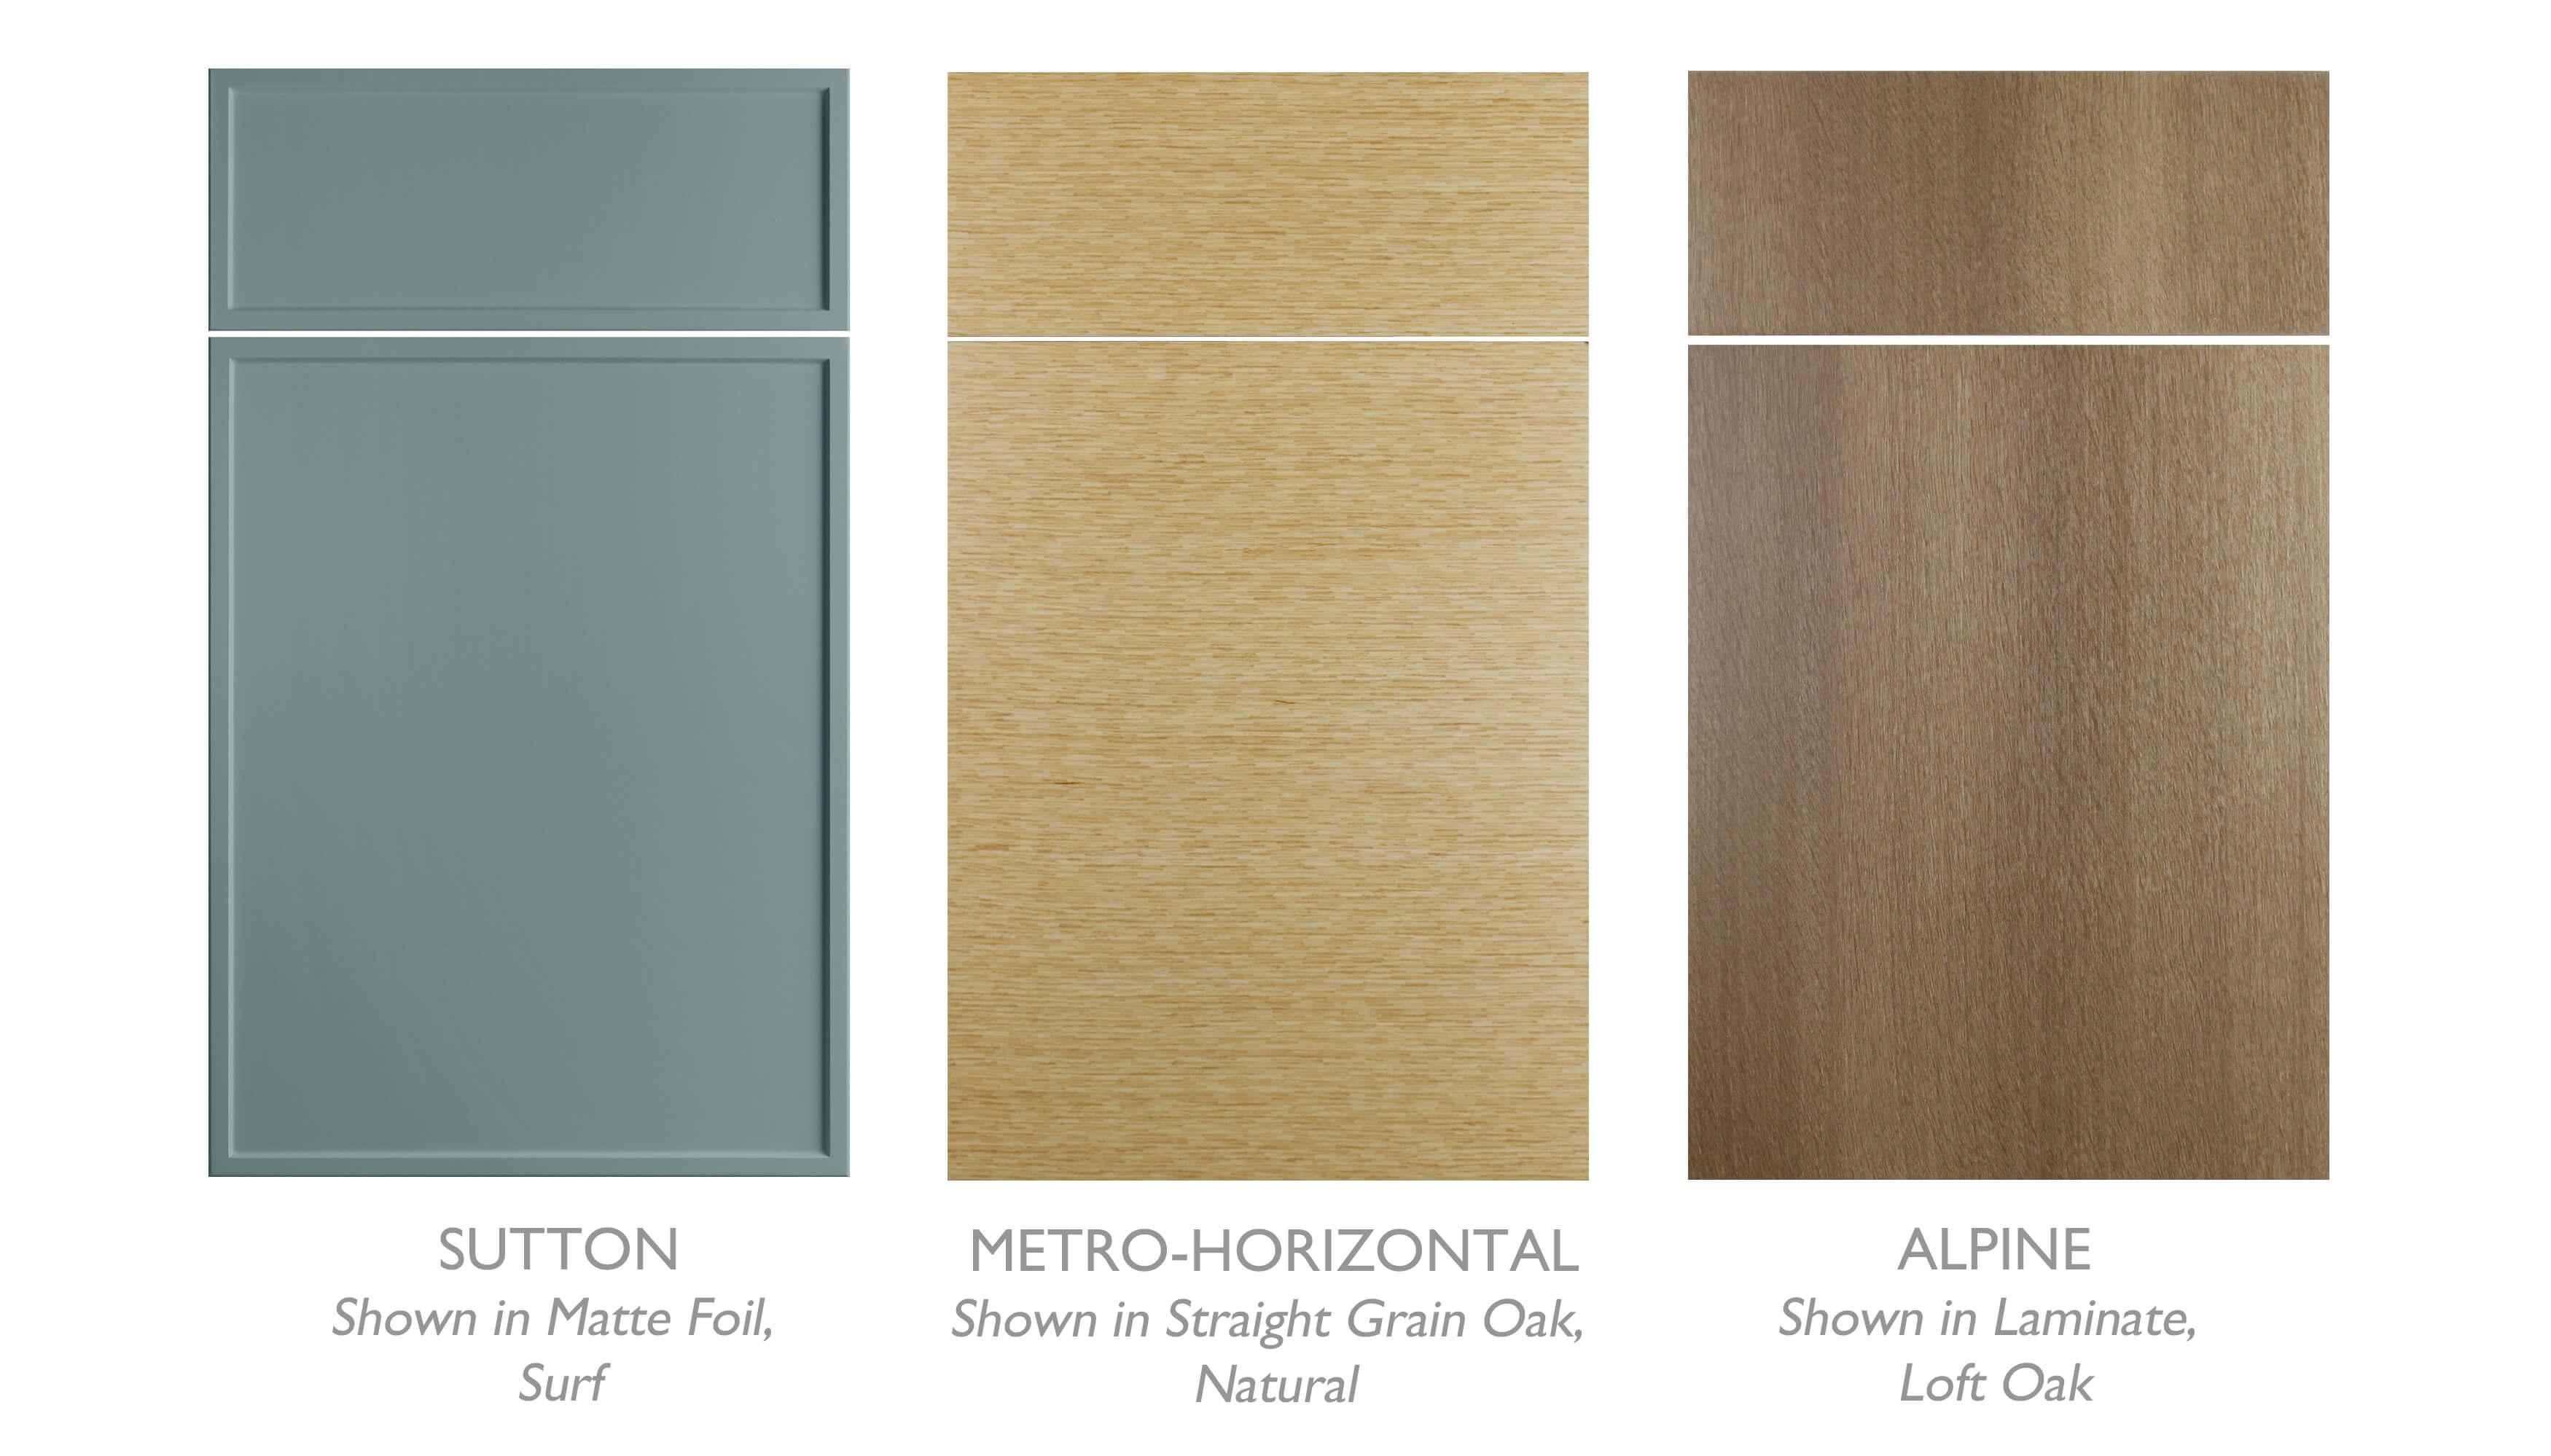 Asian Zen style cabinet door styles from Dura Supreme Cabinetry. Sutton in Surf Matte Foil, Metro-Horizontal in Straight Grain Oak Natural, and Alpine in Loft Oak Laminate.